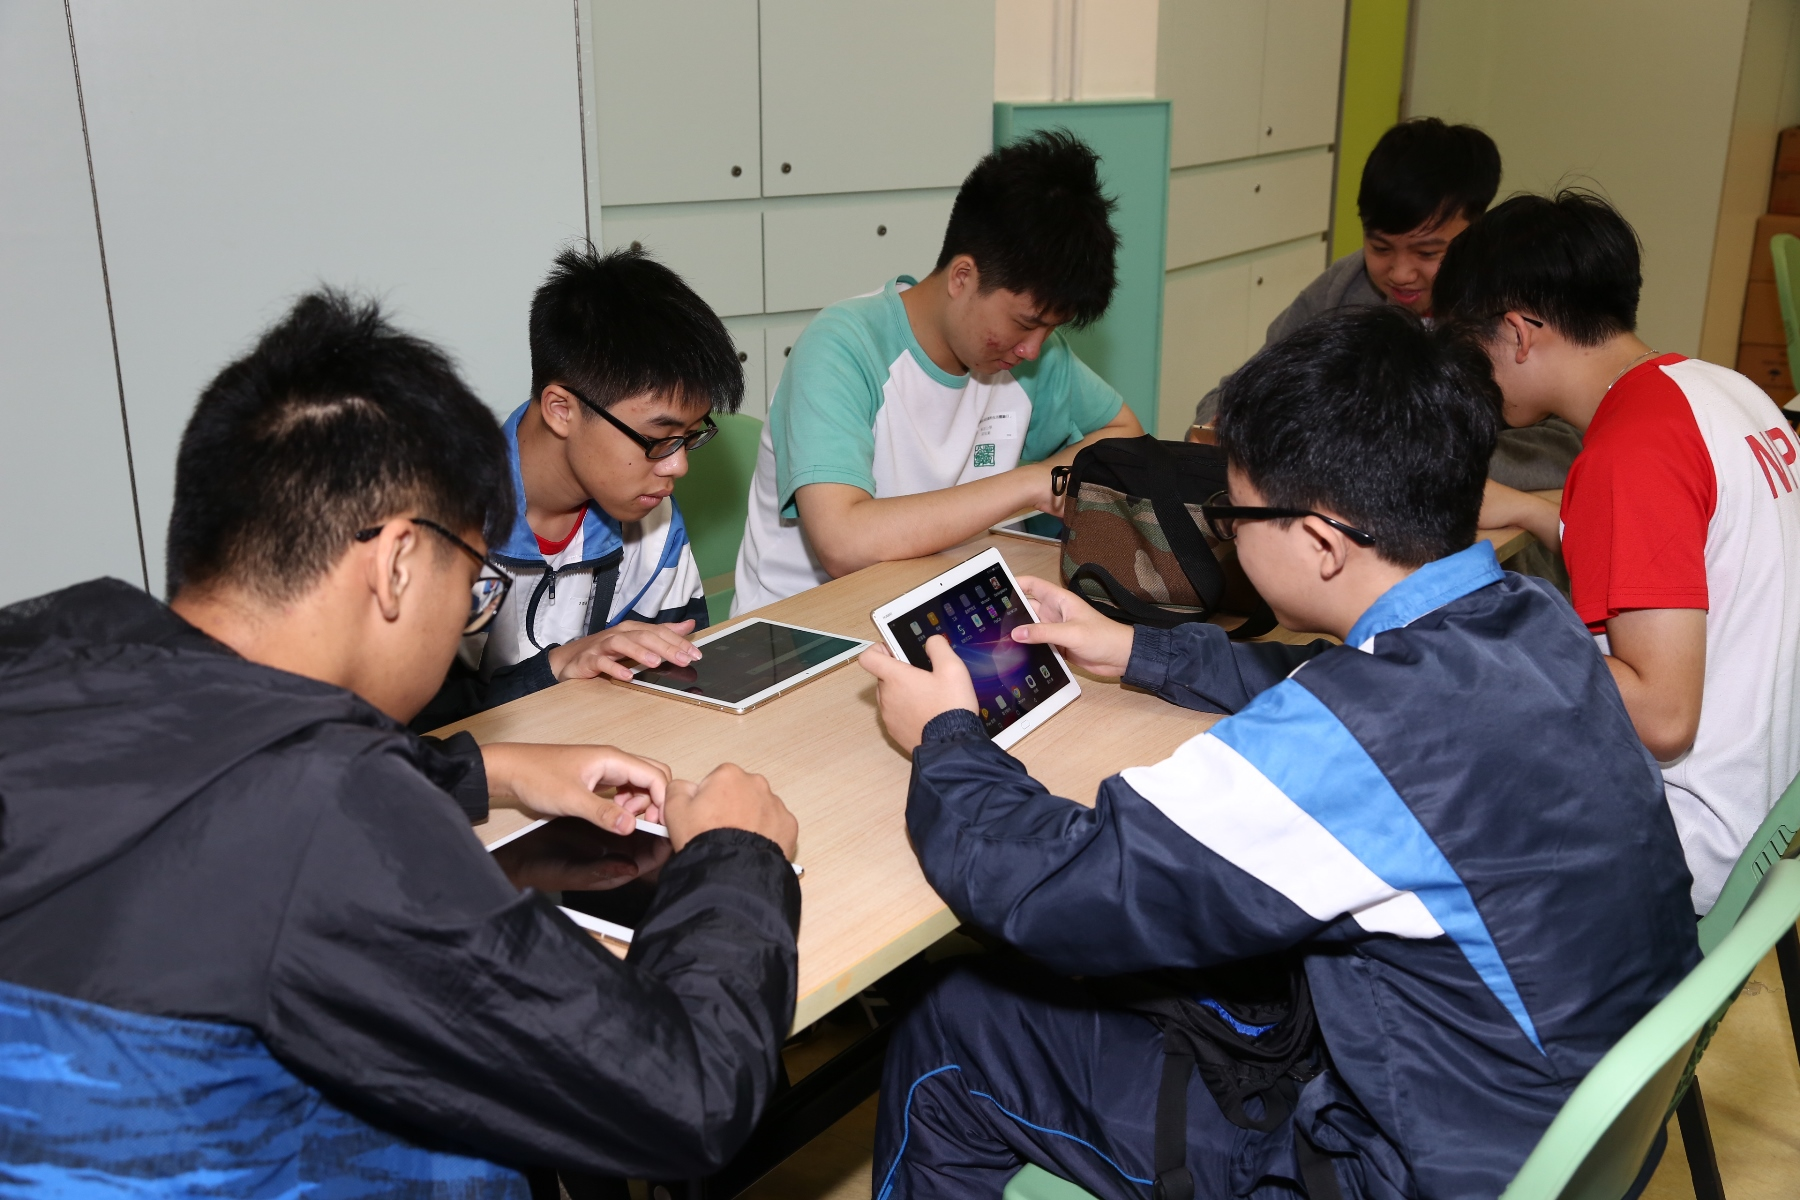 http://npc.edu.hk/sites/default/files/a_2.jpg